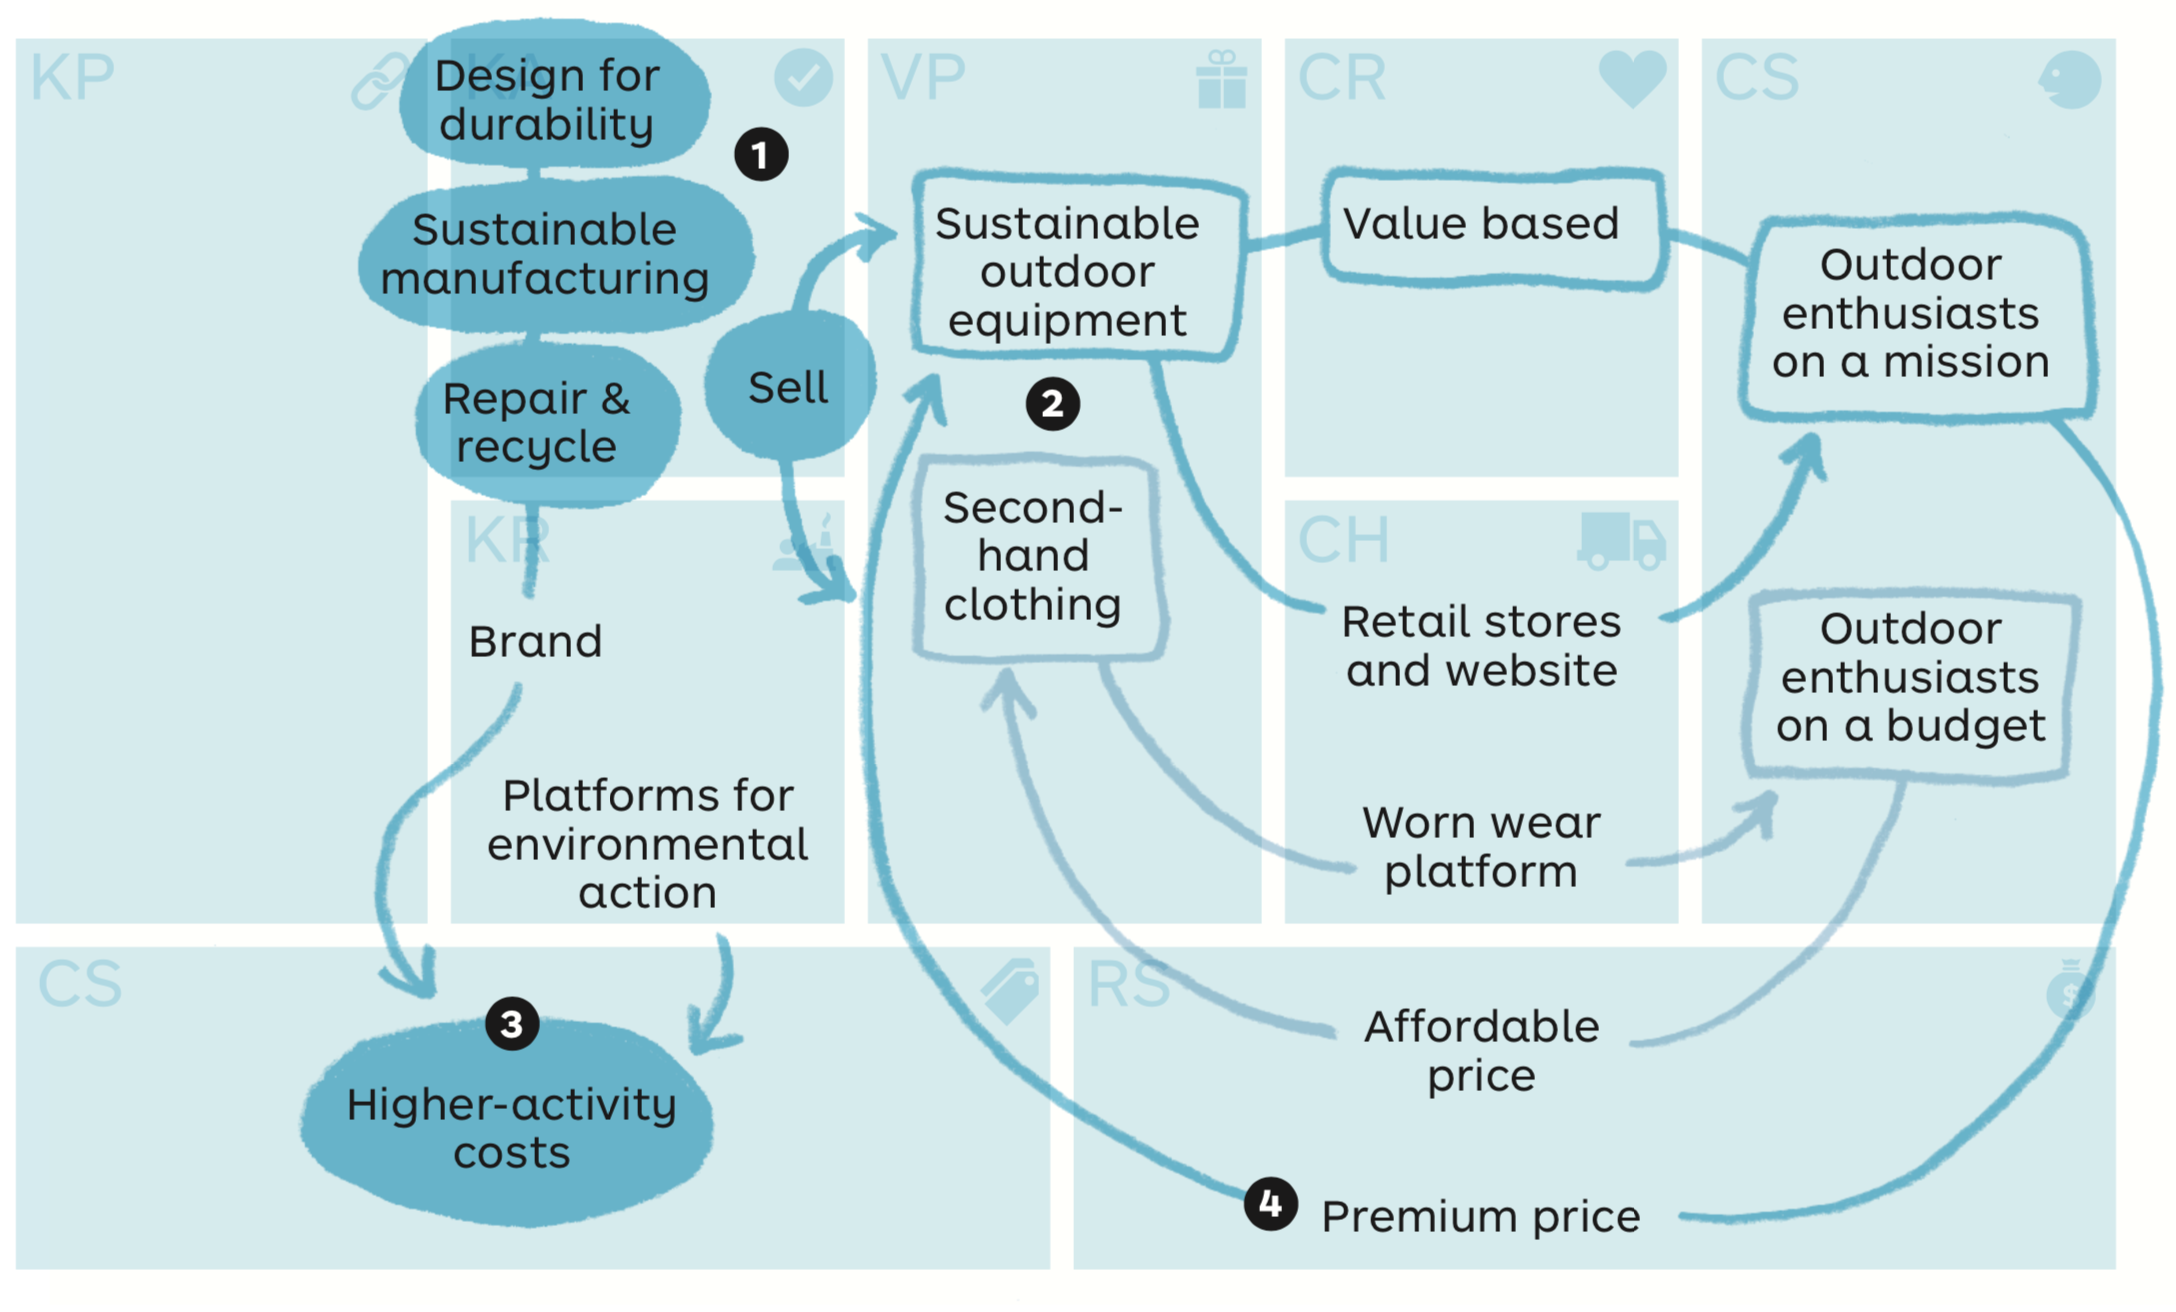 Patagonia Business Model